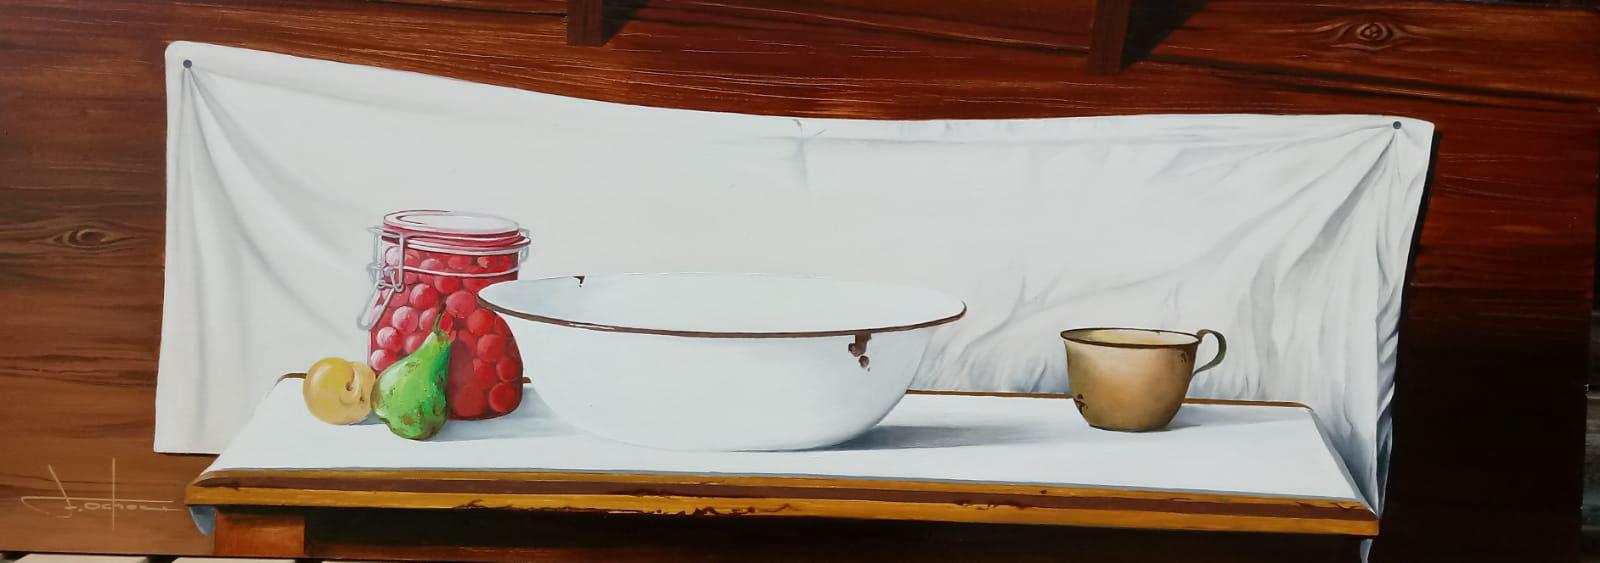 BODEGÓN 70x25 Óleo sobre tablero de madera